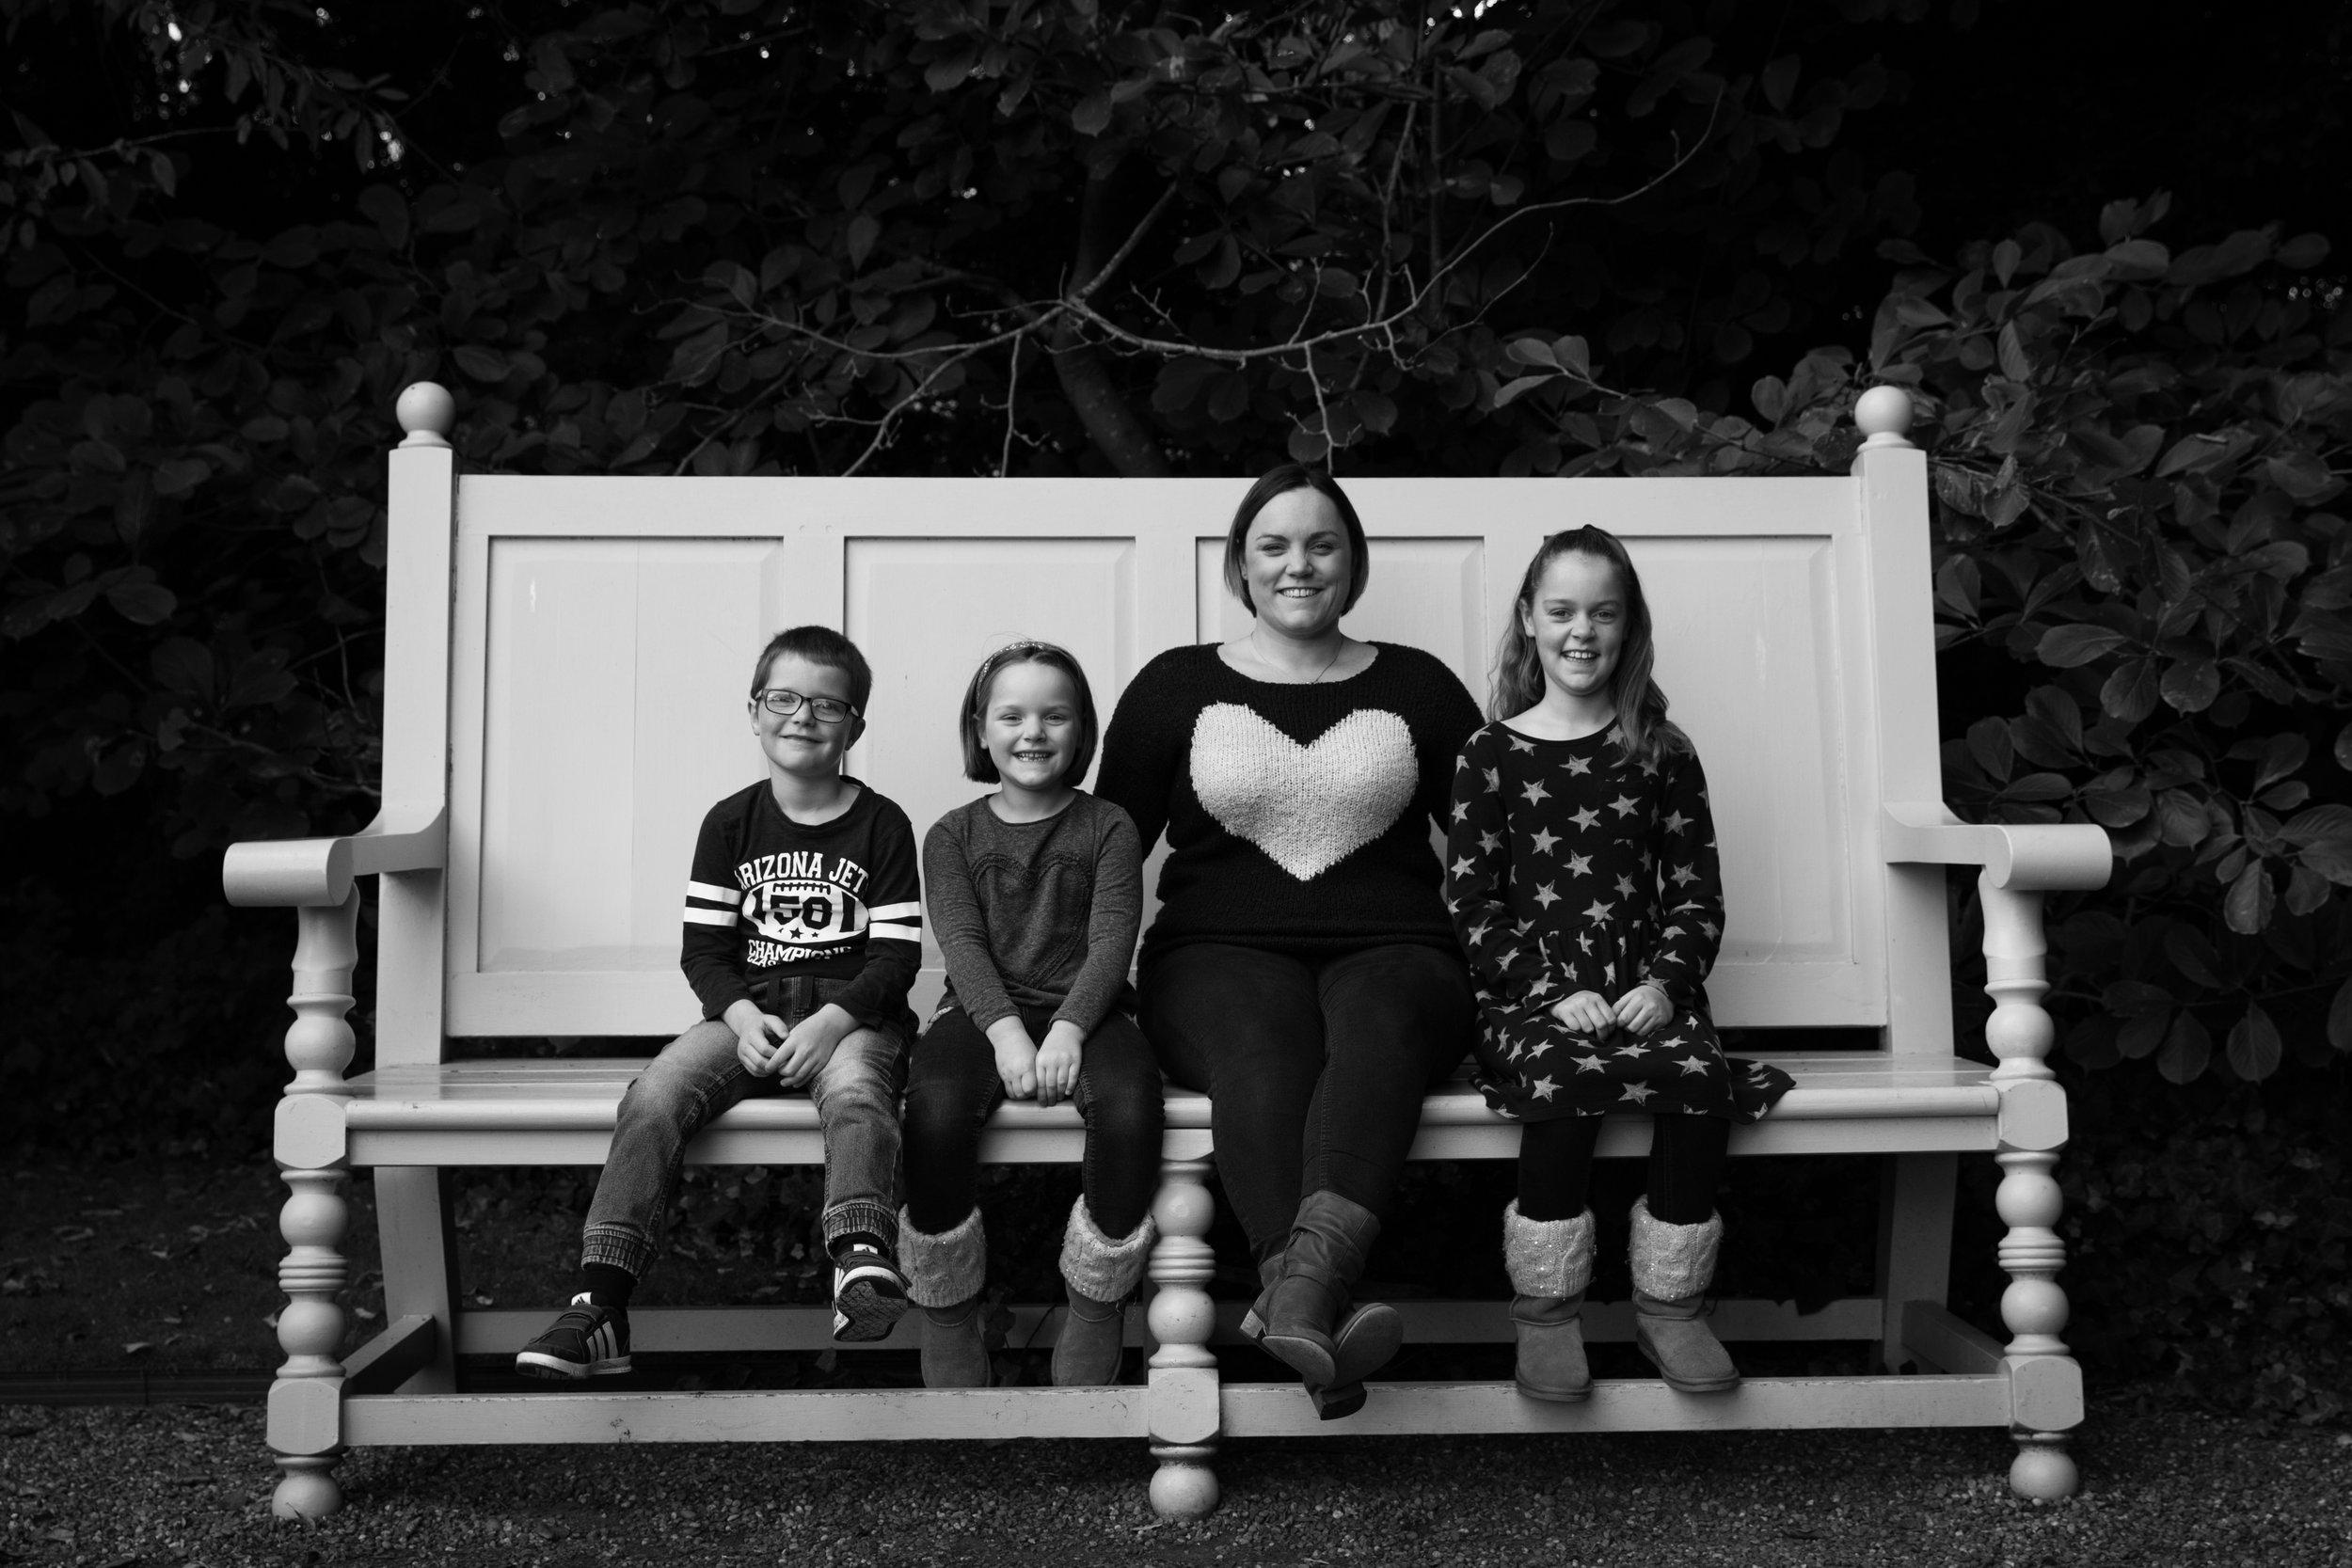 Sudbury Hall benches